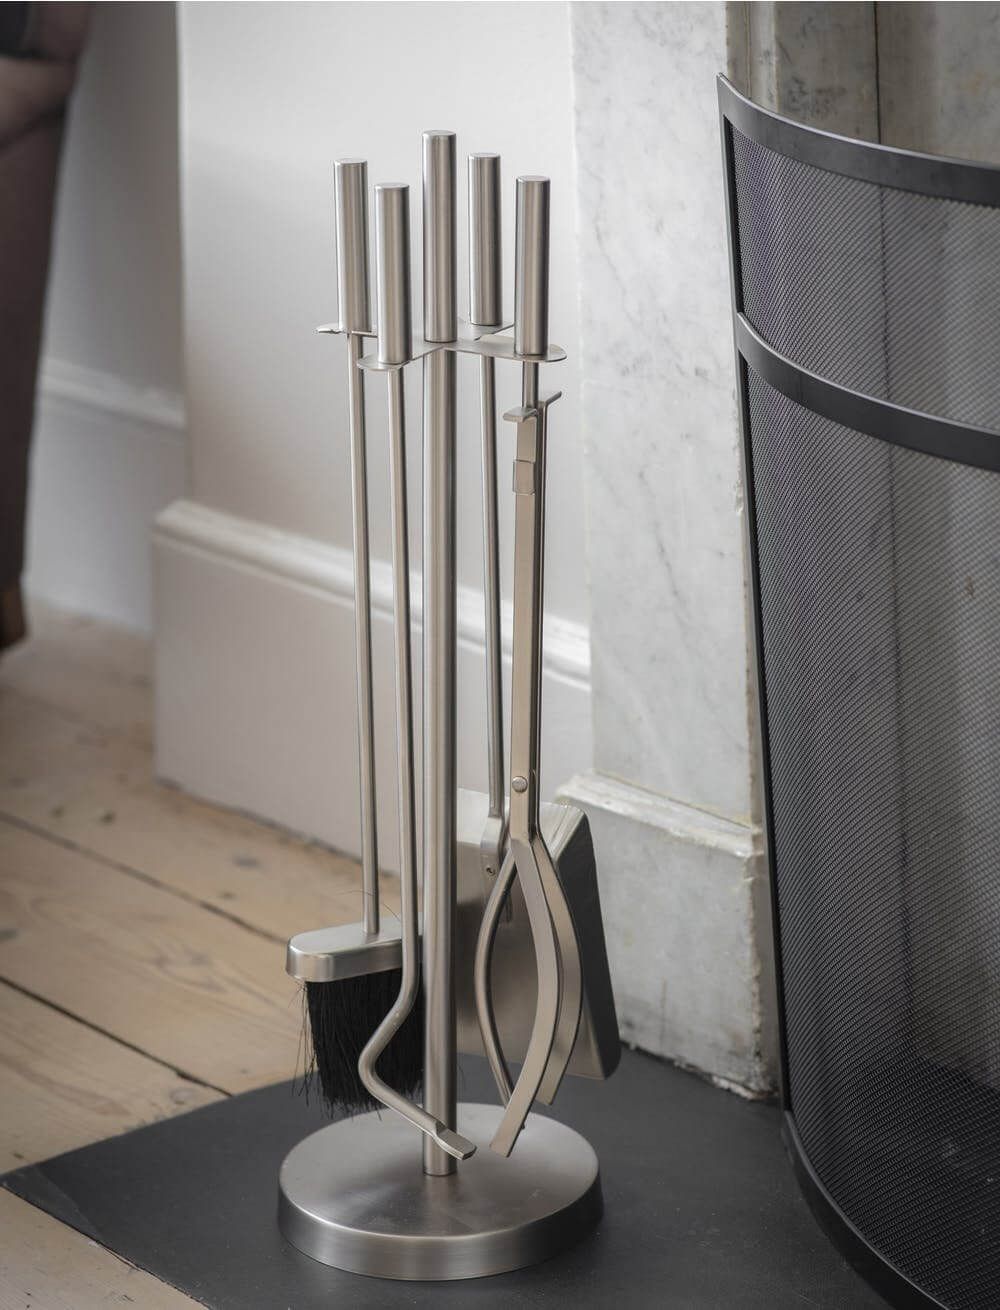 Tawstock Fireside Tool Set